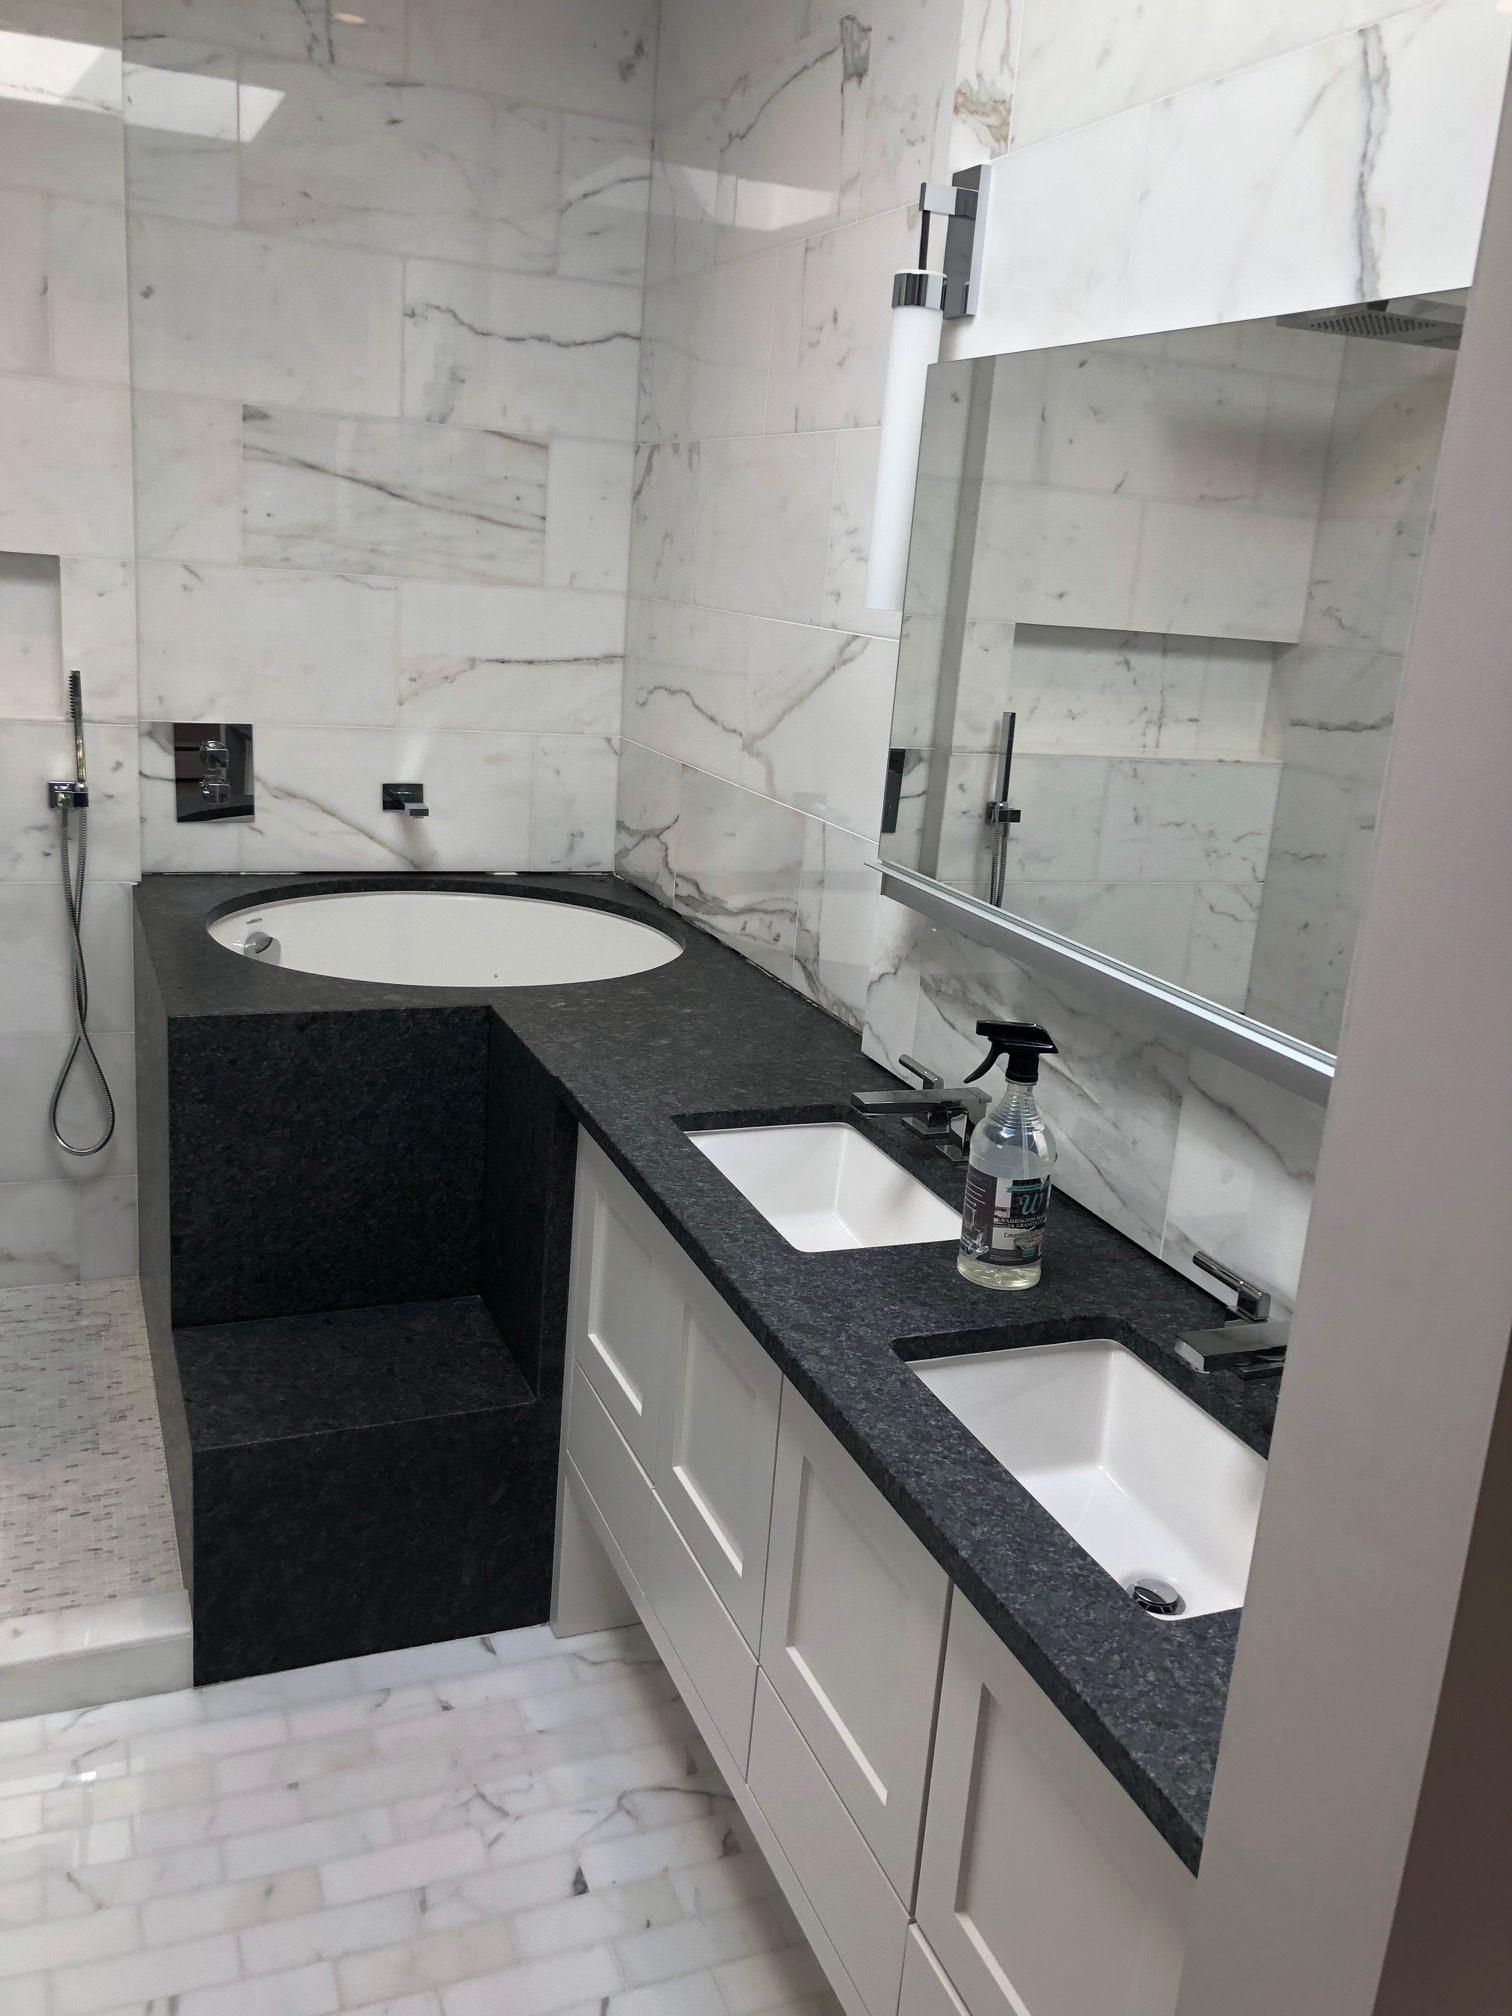 Bathroom remodeling in Maryland